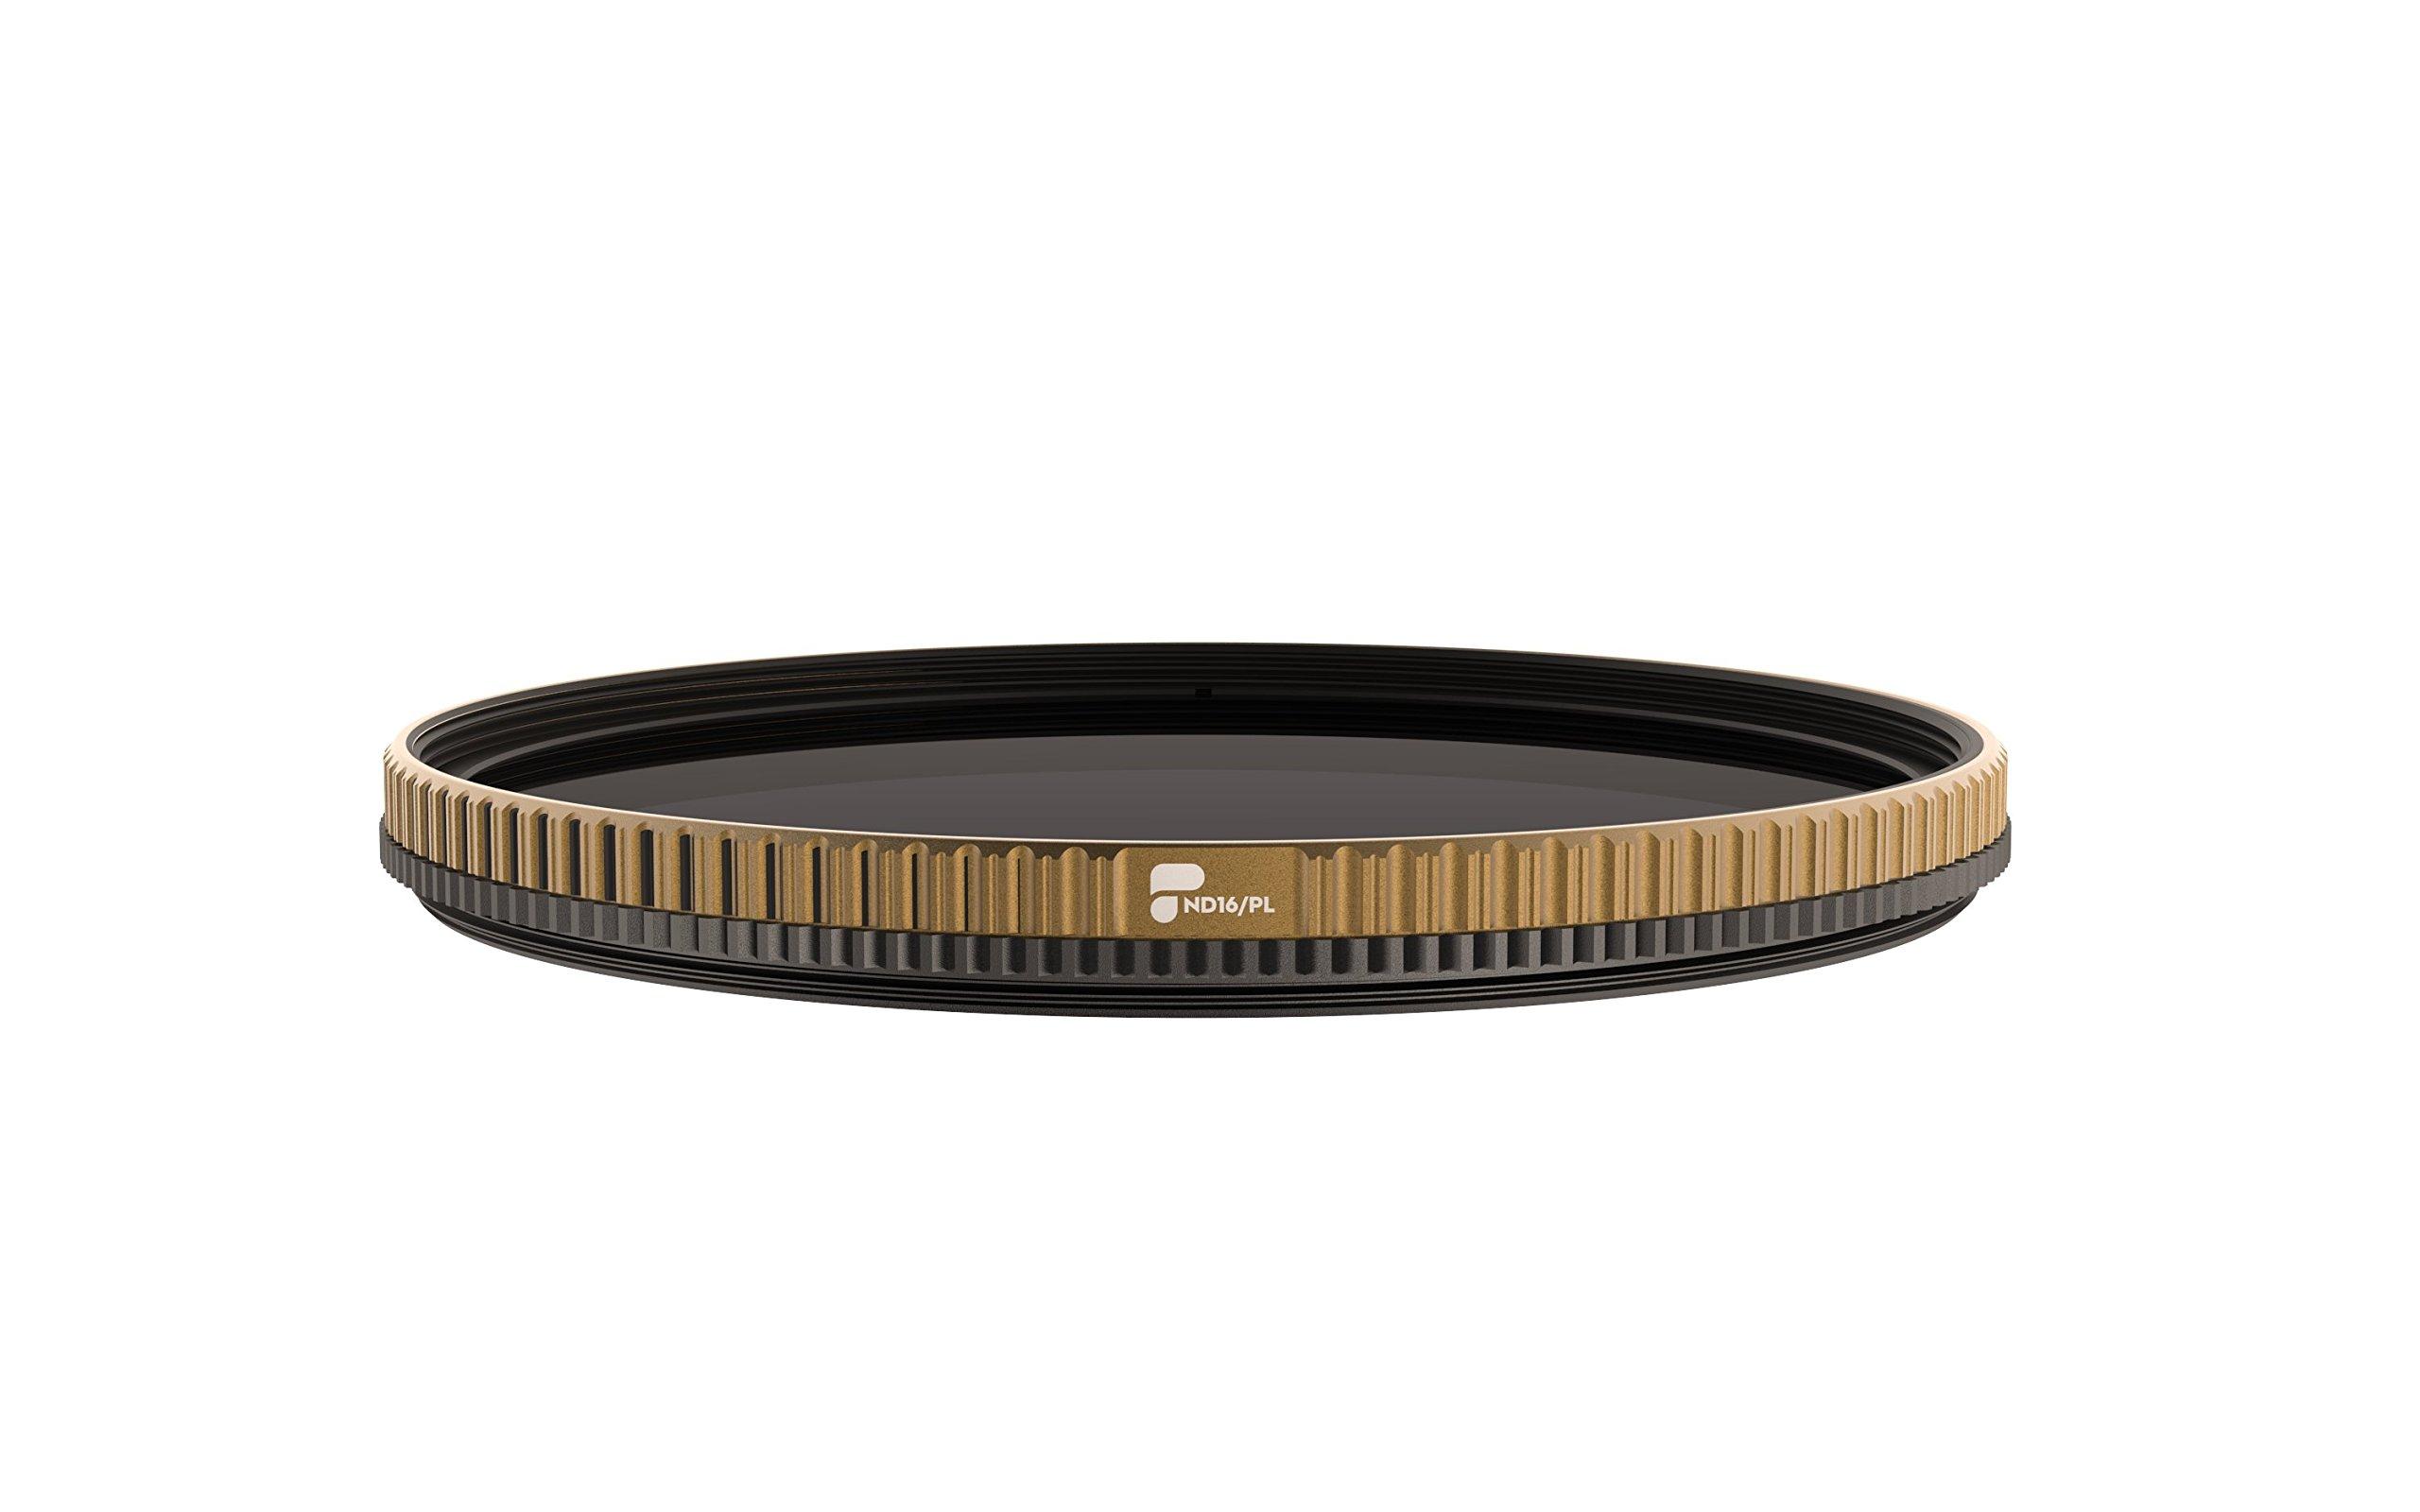 PolarPro QuartzLine 77mm ND16/PL Camera Filter (4-Stop Neutral Density / Polarizer hybrid filter)